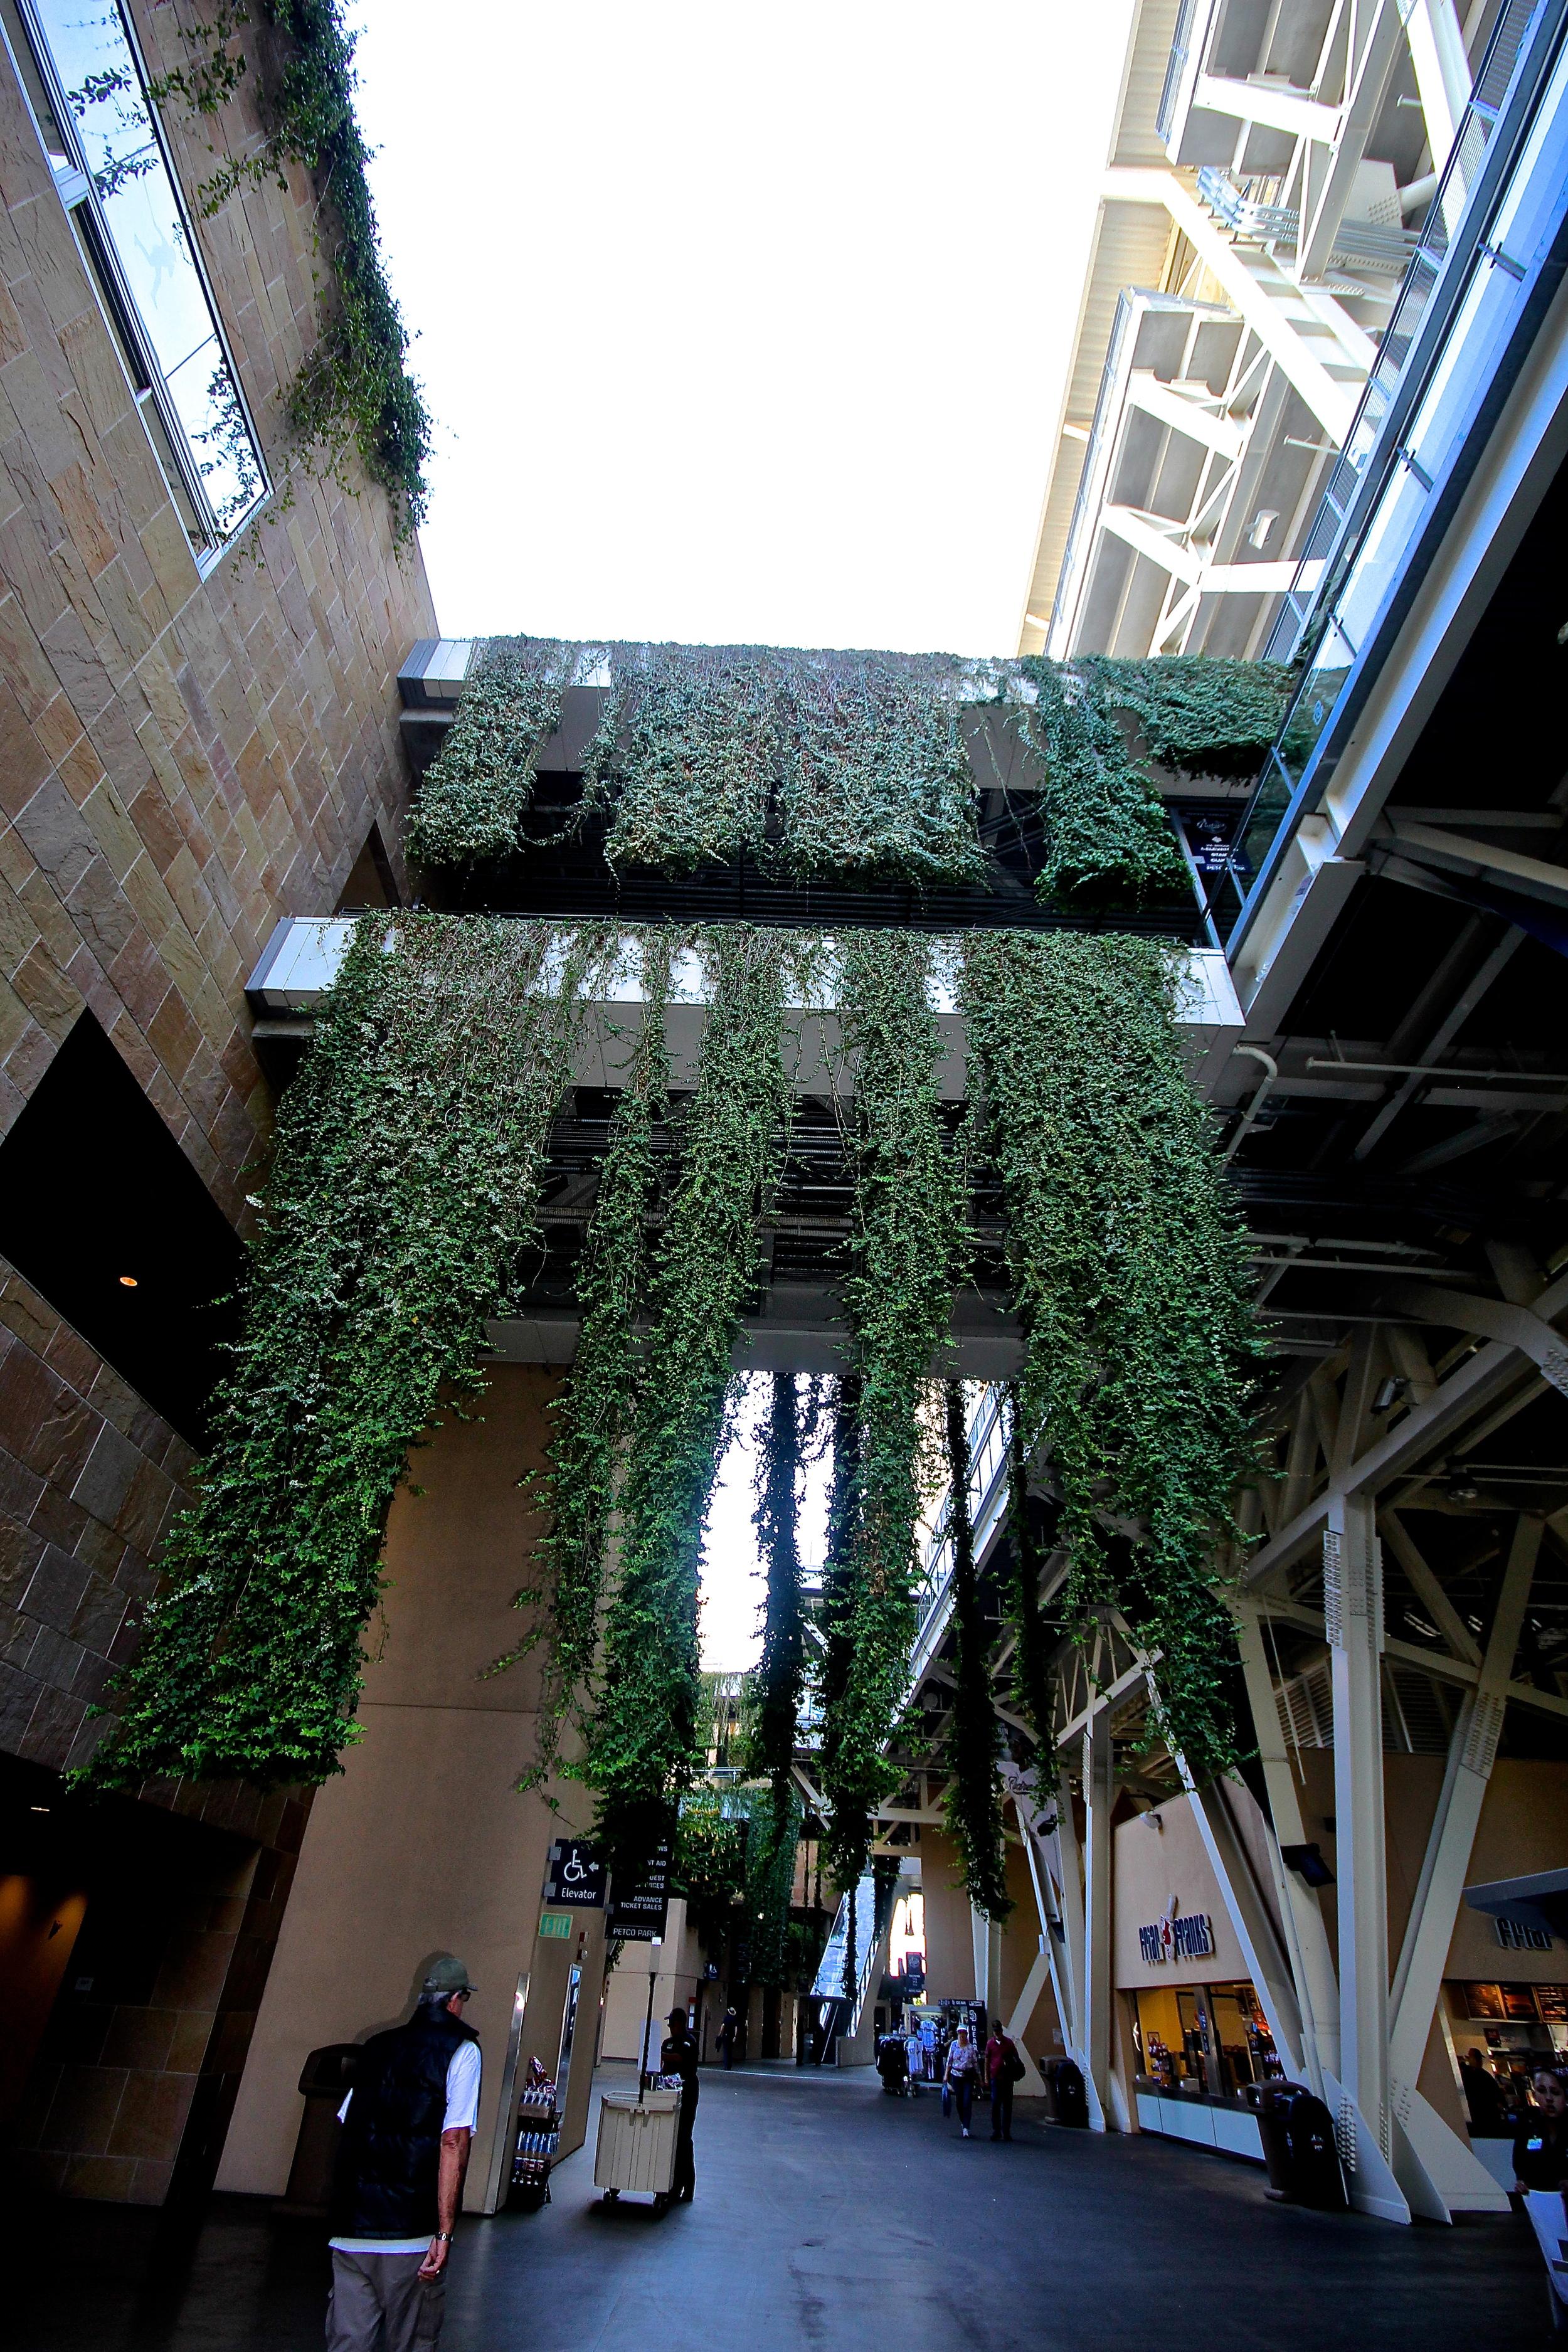 Vegetation inside Petco